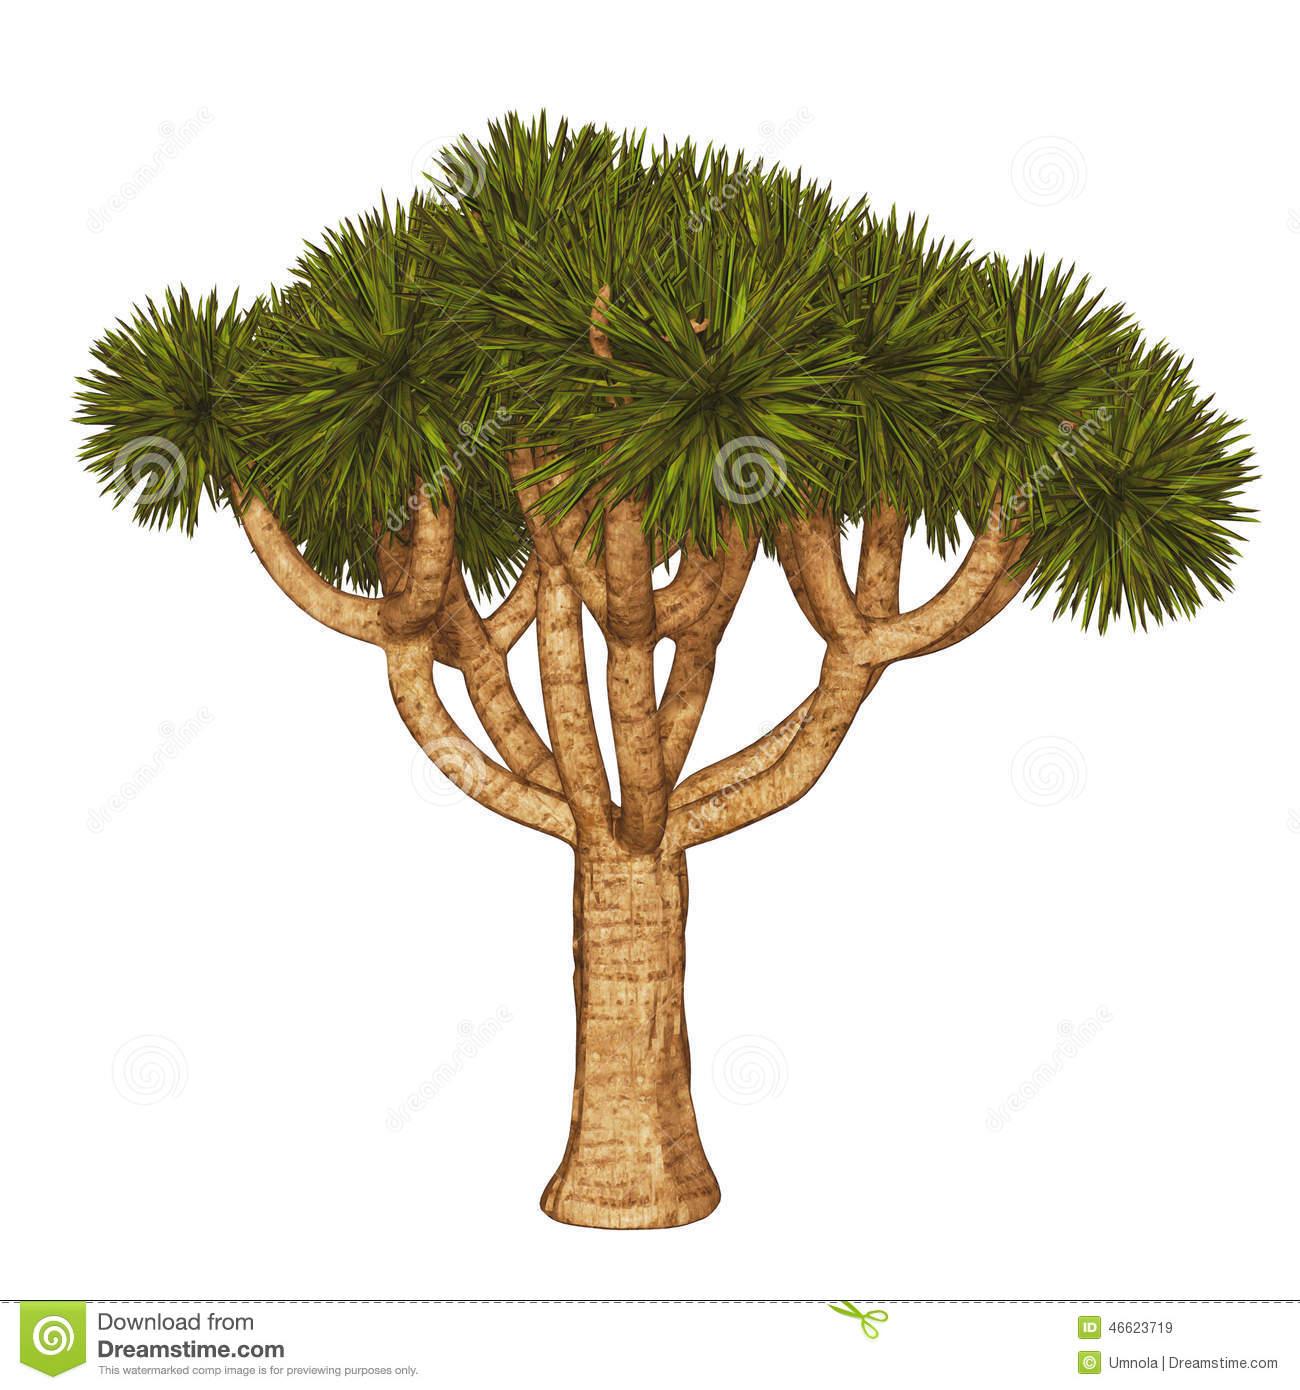 Joshua Tree clipart #19, Download drawings